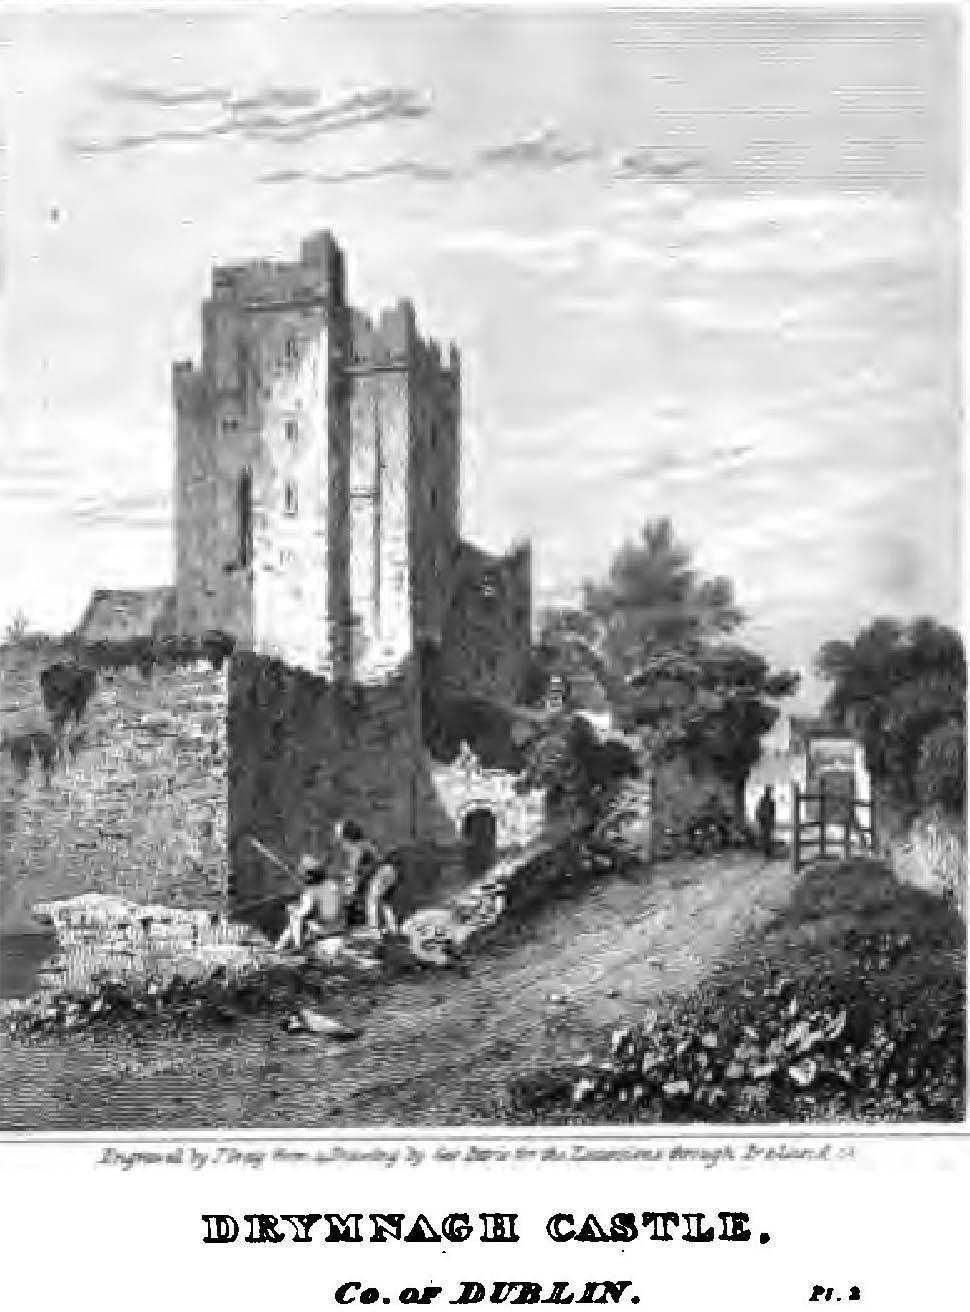 The last castle essay